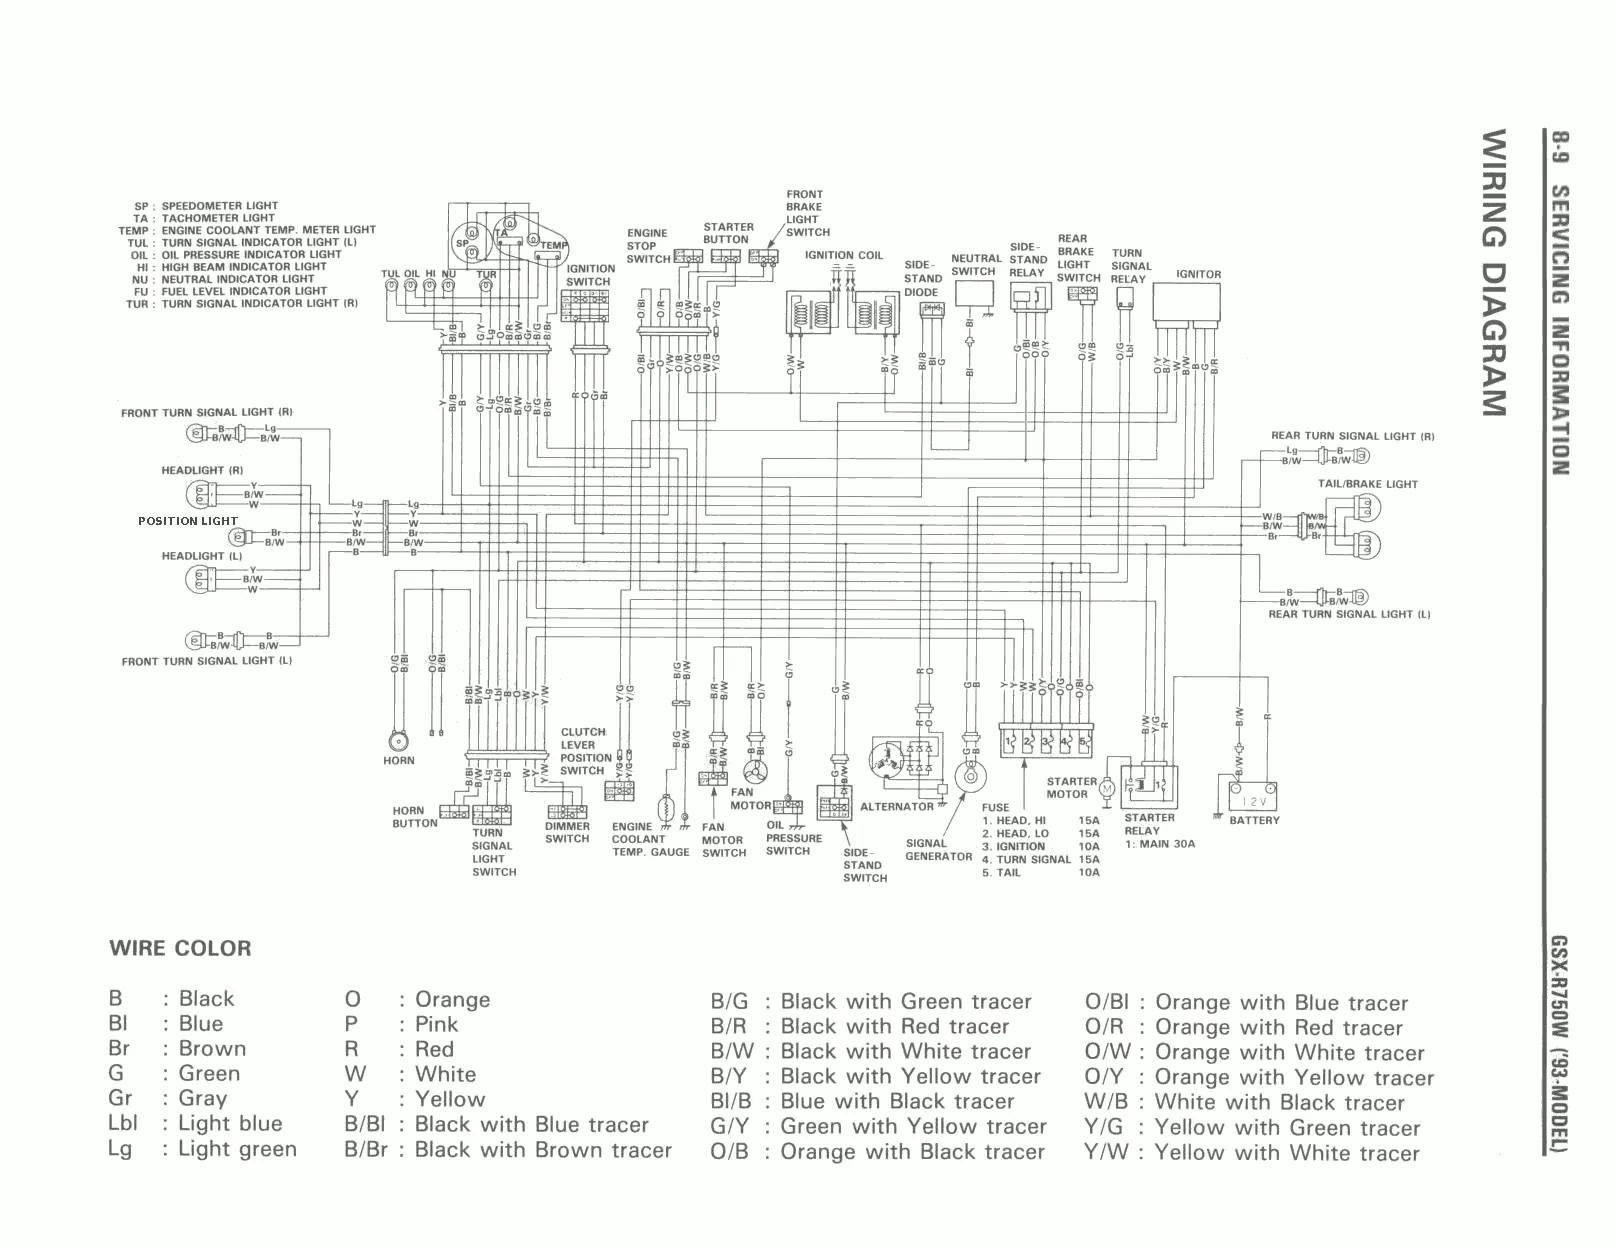 hight resolution of 07 gsxr 750 wiring diagram 07 free engine image for user 2000 gsxr 750 wiring diagram